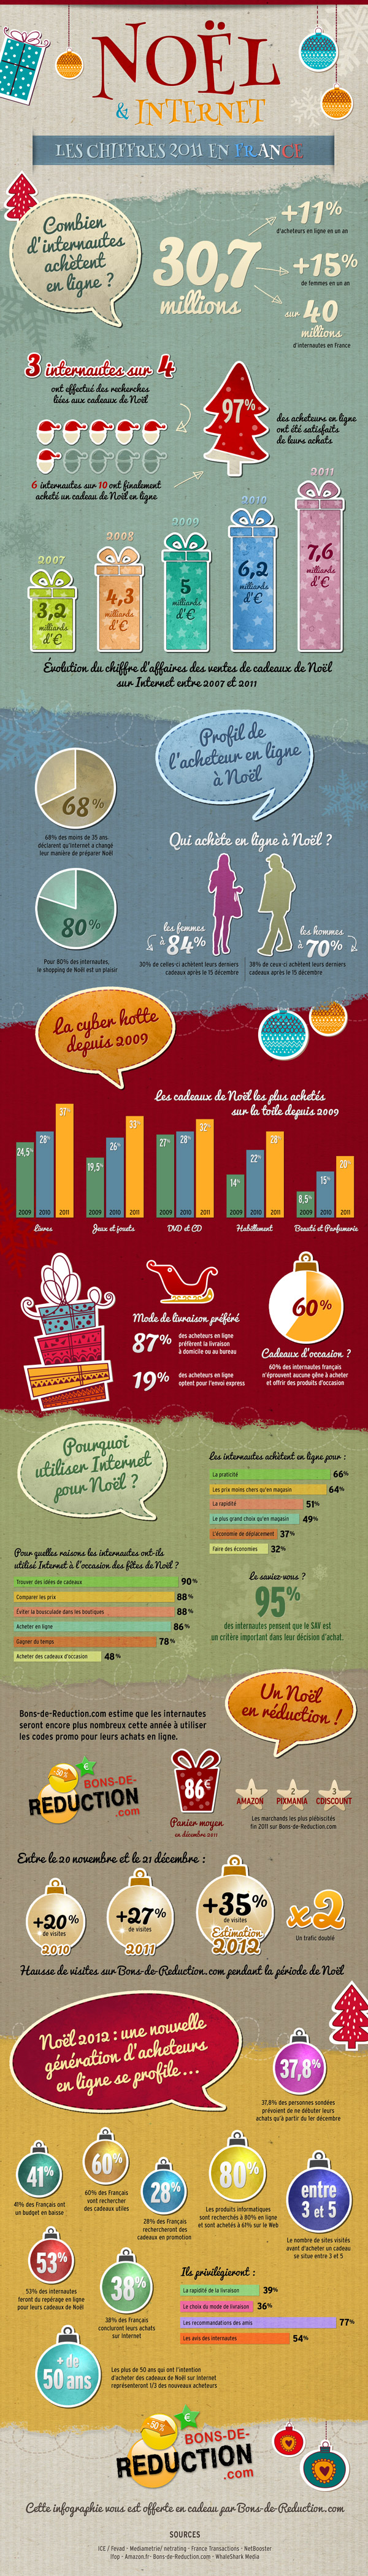 infographie noel internet